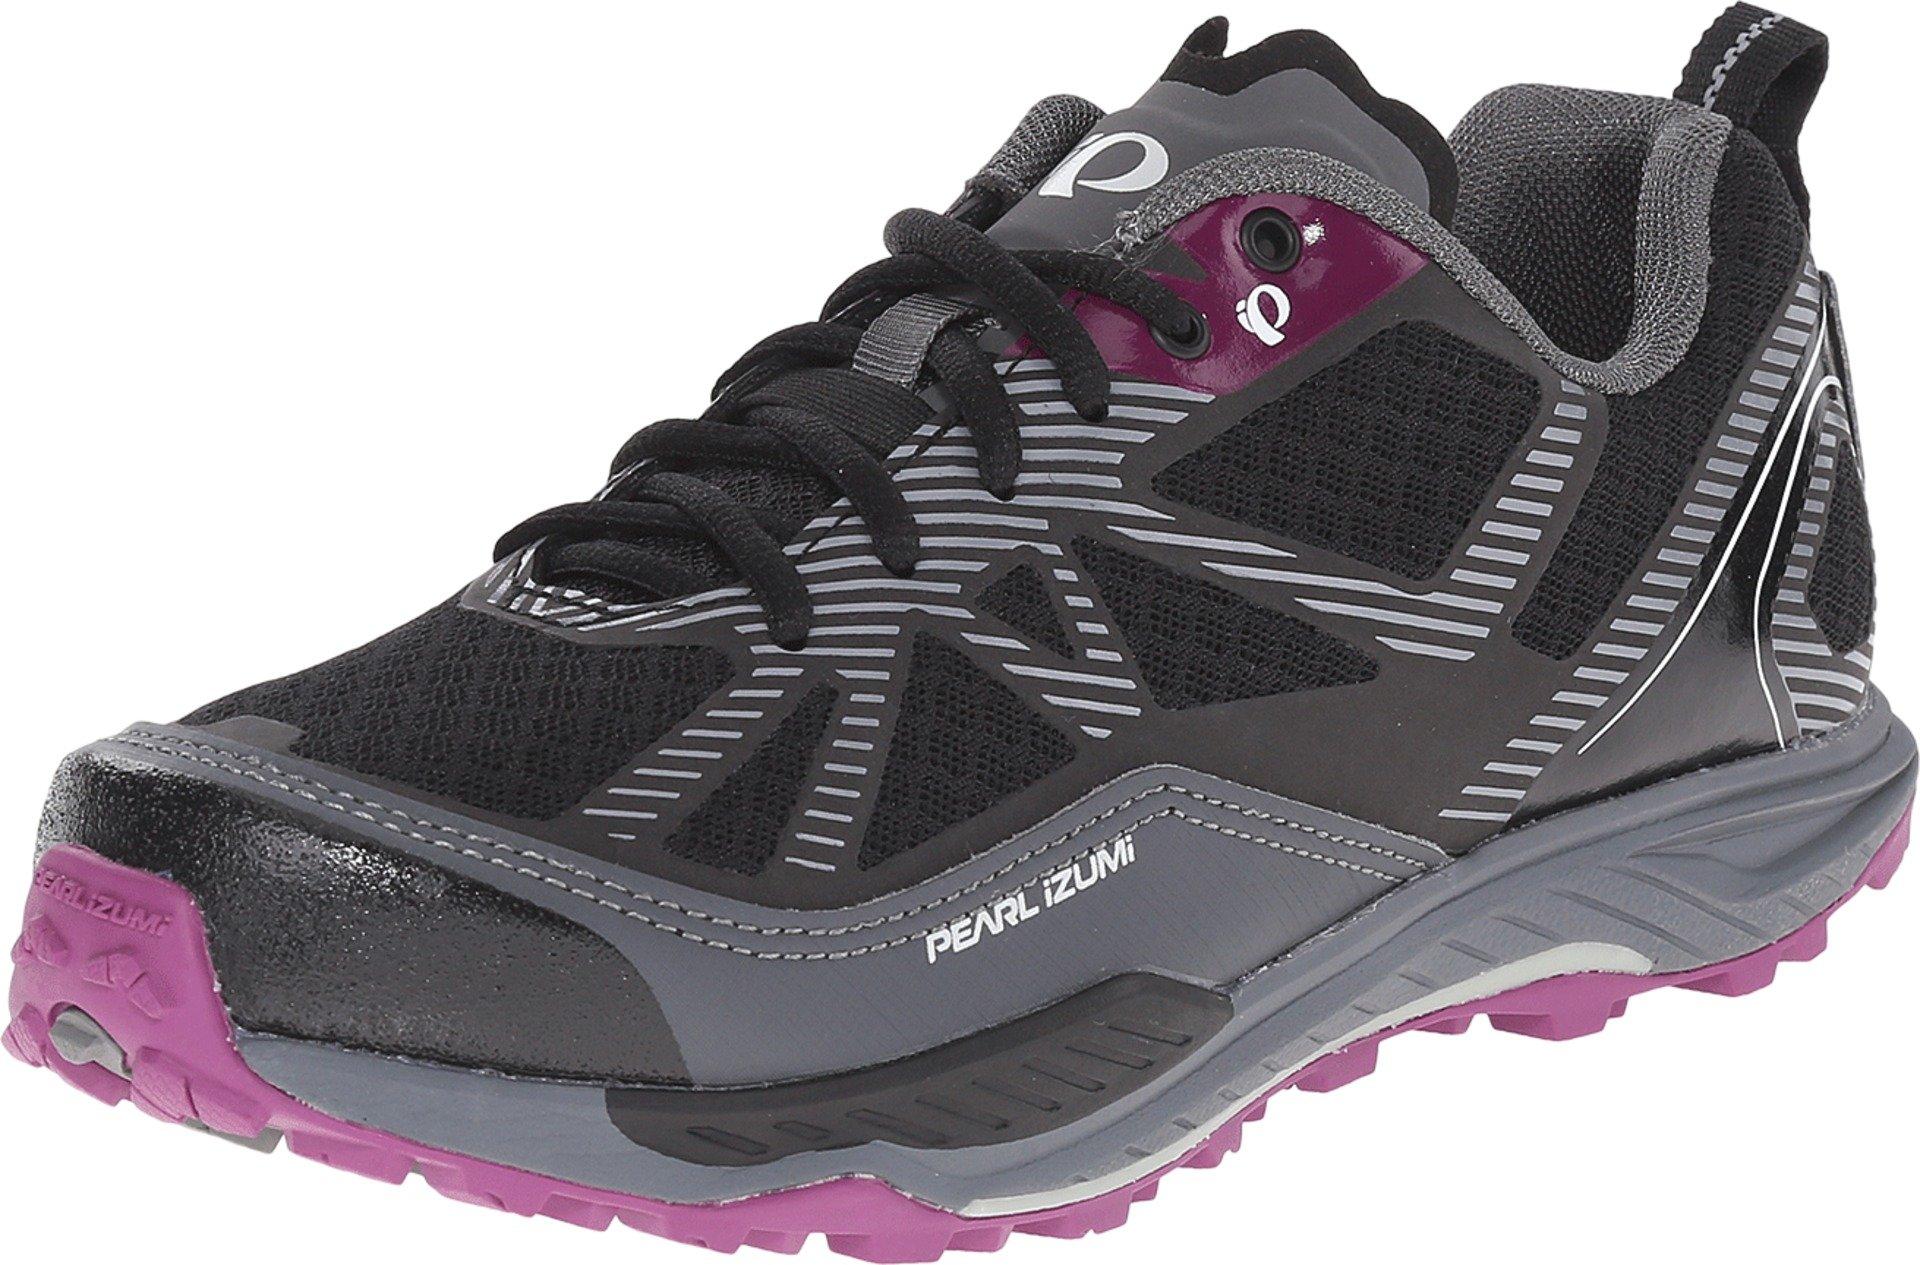 Pearl Izumi Women's W X-ALP Seek VII Cycling Shoe, Black/Belgian Block, 42 EU/10 B US